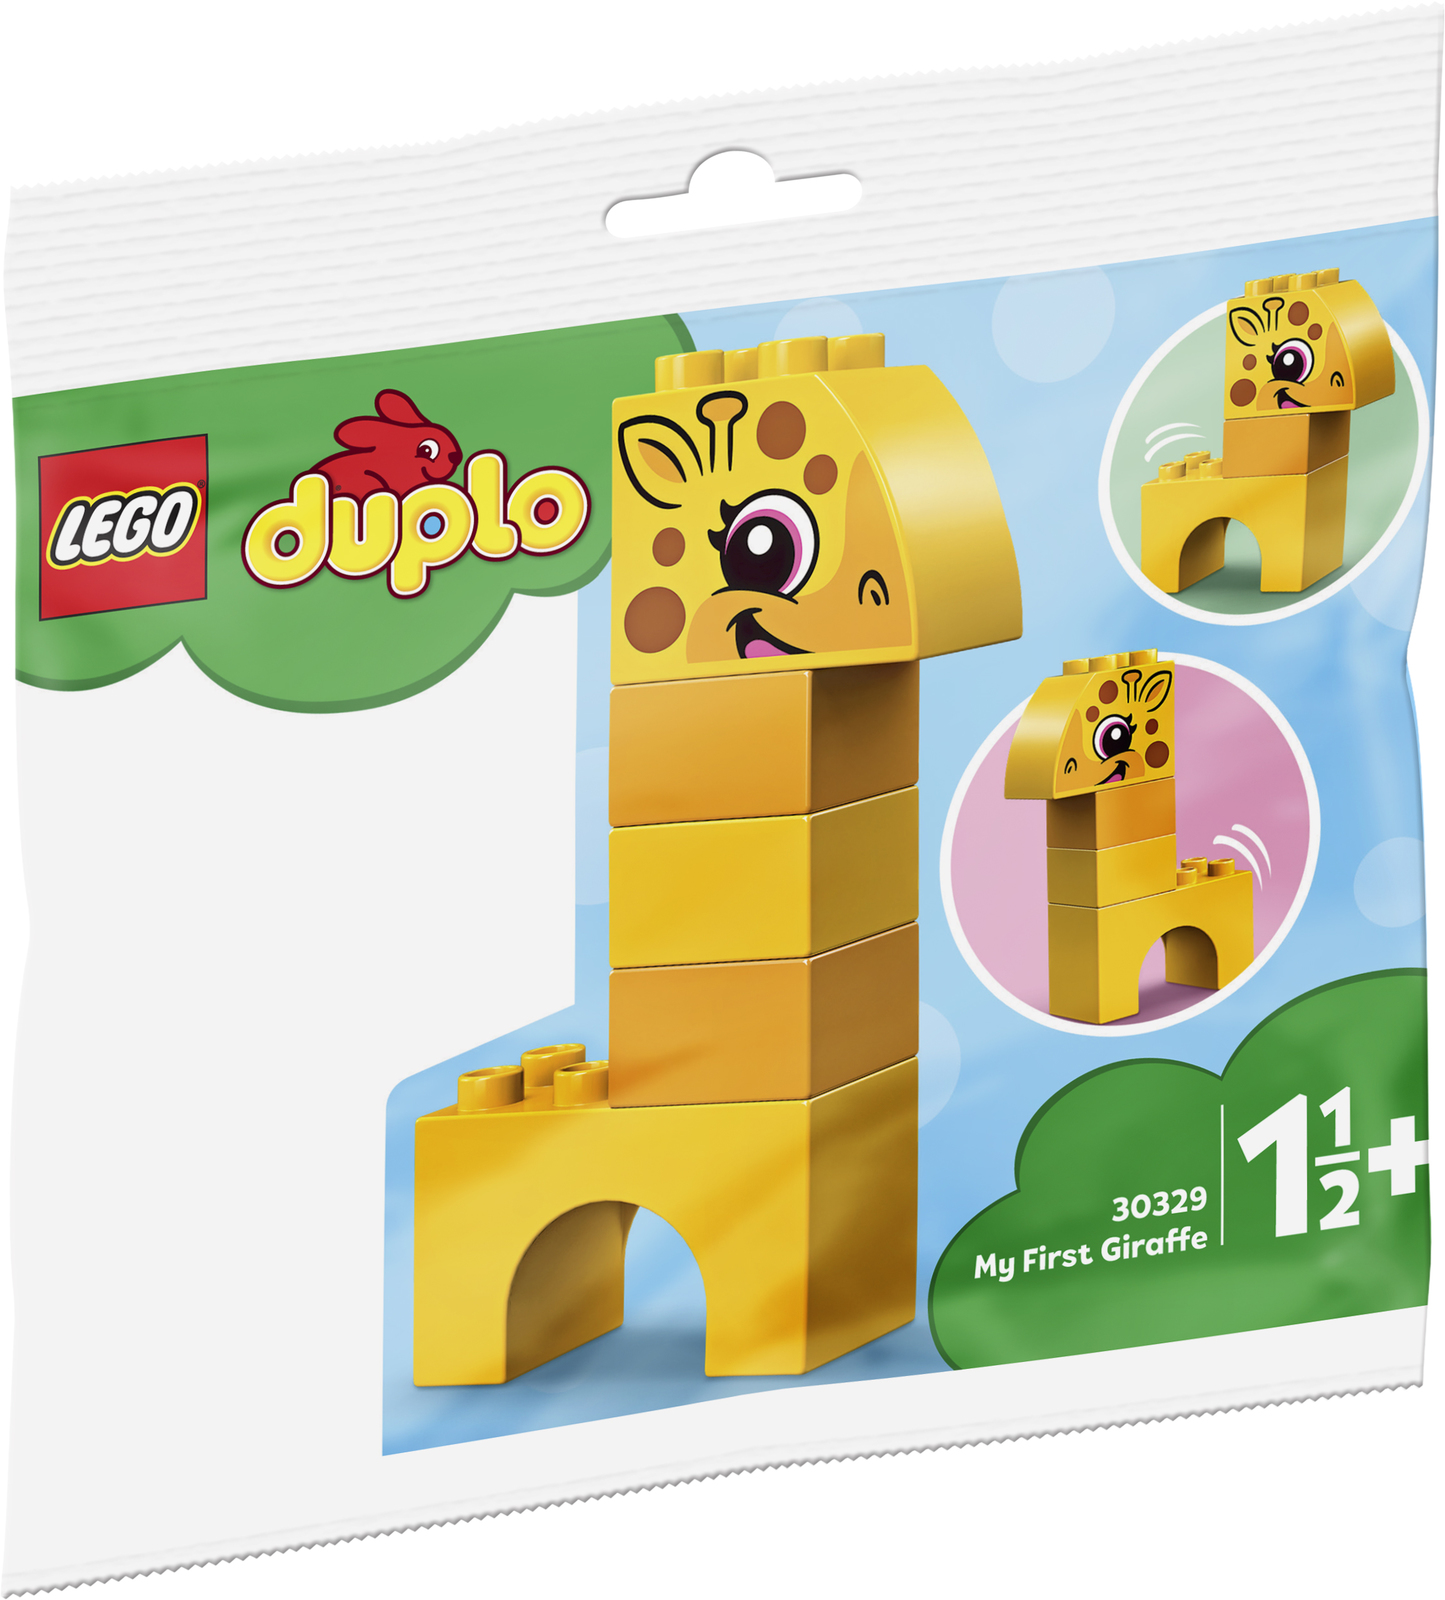 Lego: My First Giraffe image